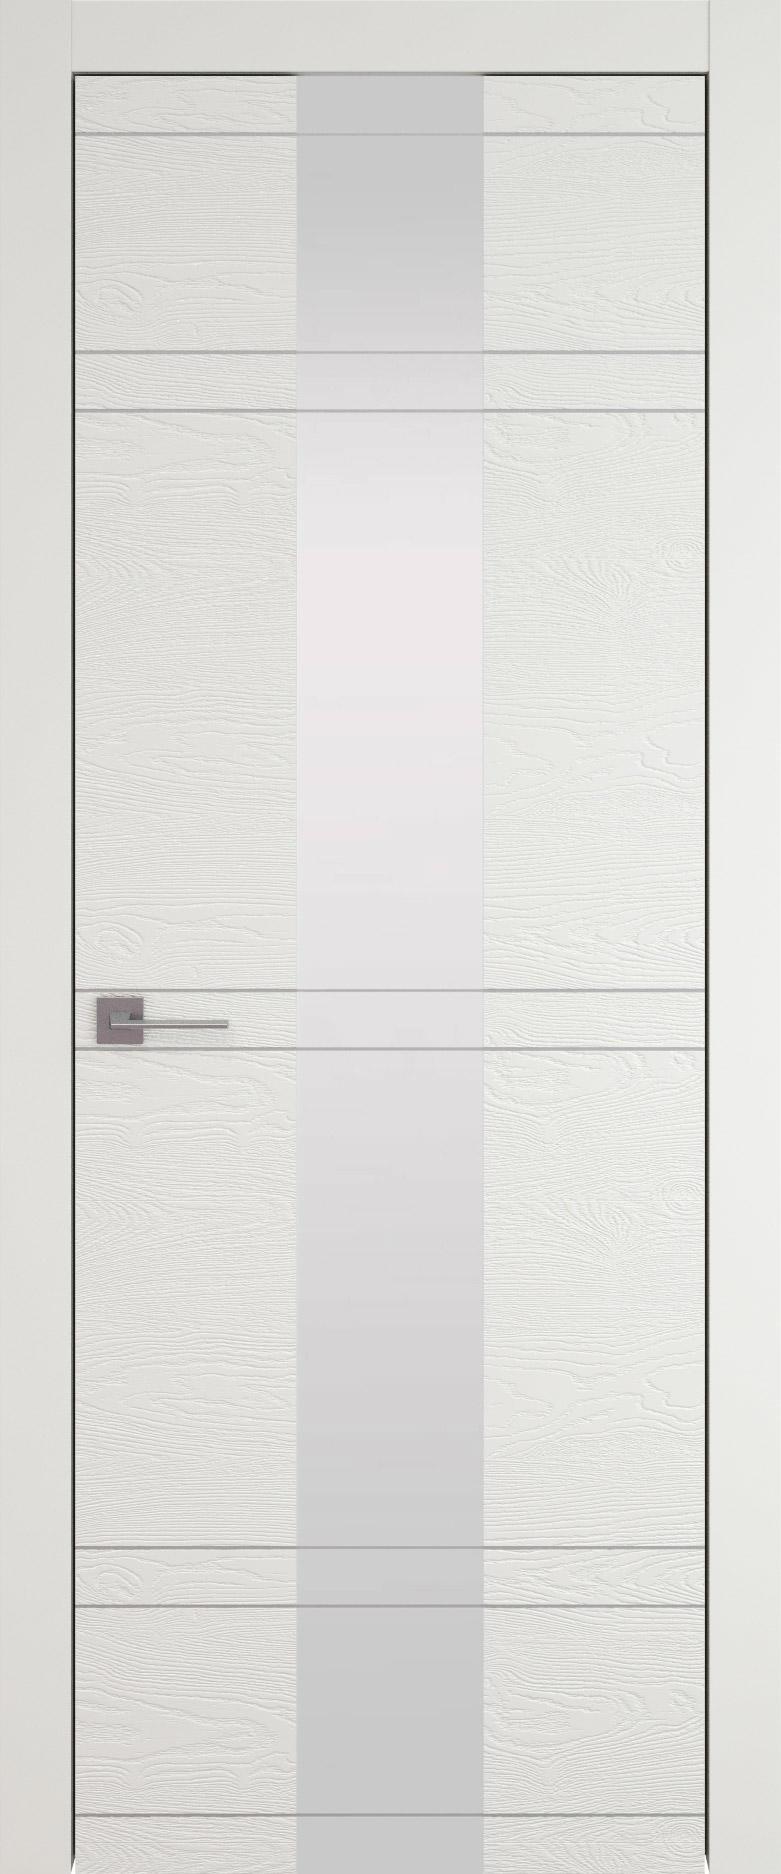 Tivoli Ж-4 цвет - Бежевая эмаль по шпону (RAL 9010) Со стеклом (ДО)